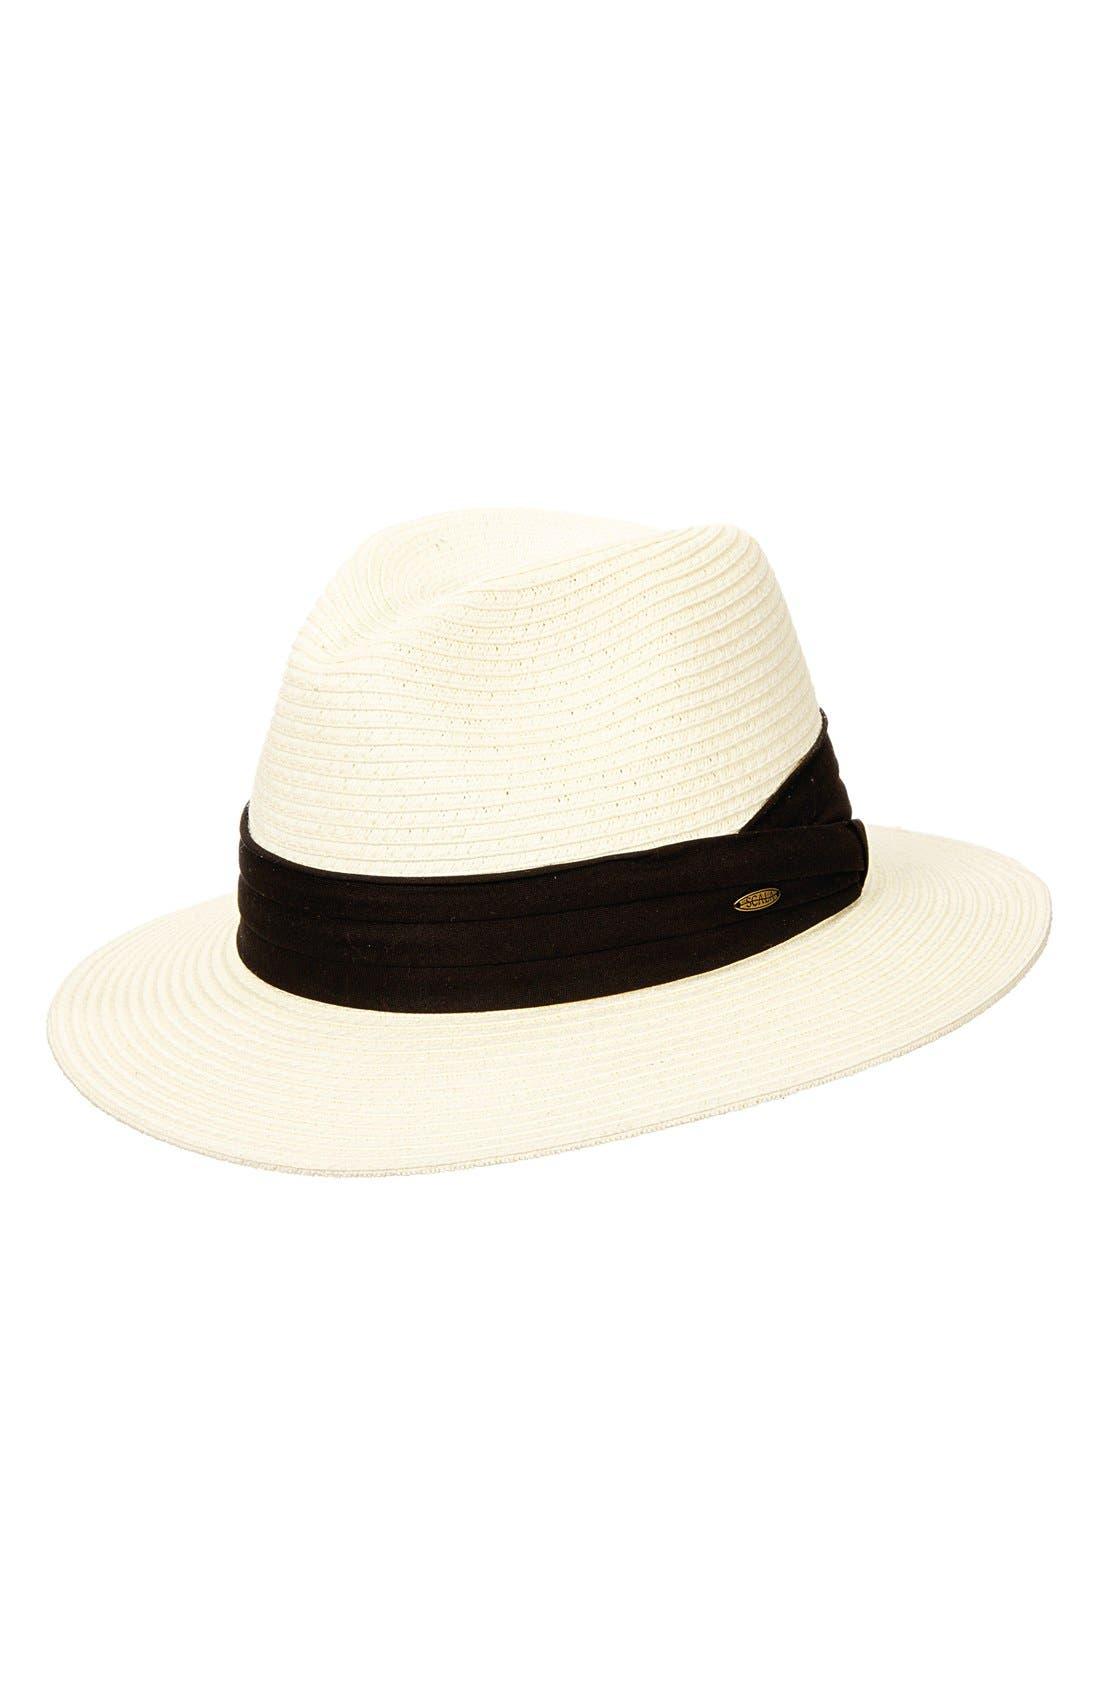 Main Image - Scala Safari Hat